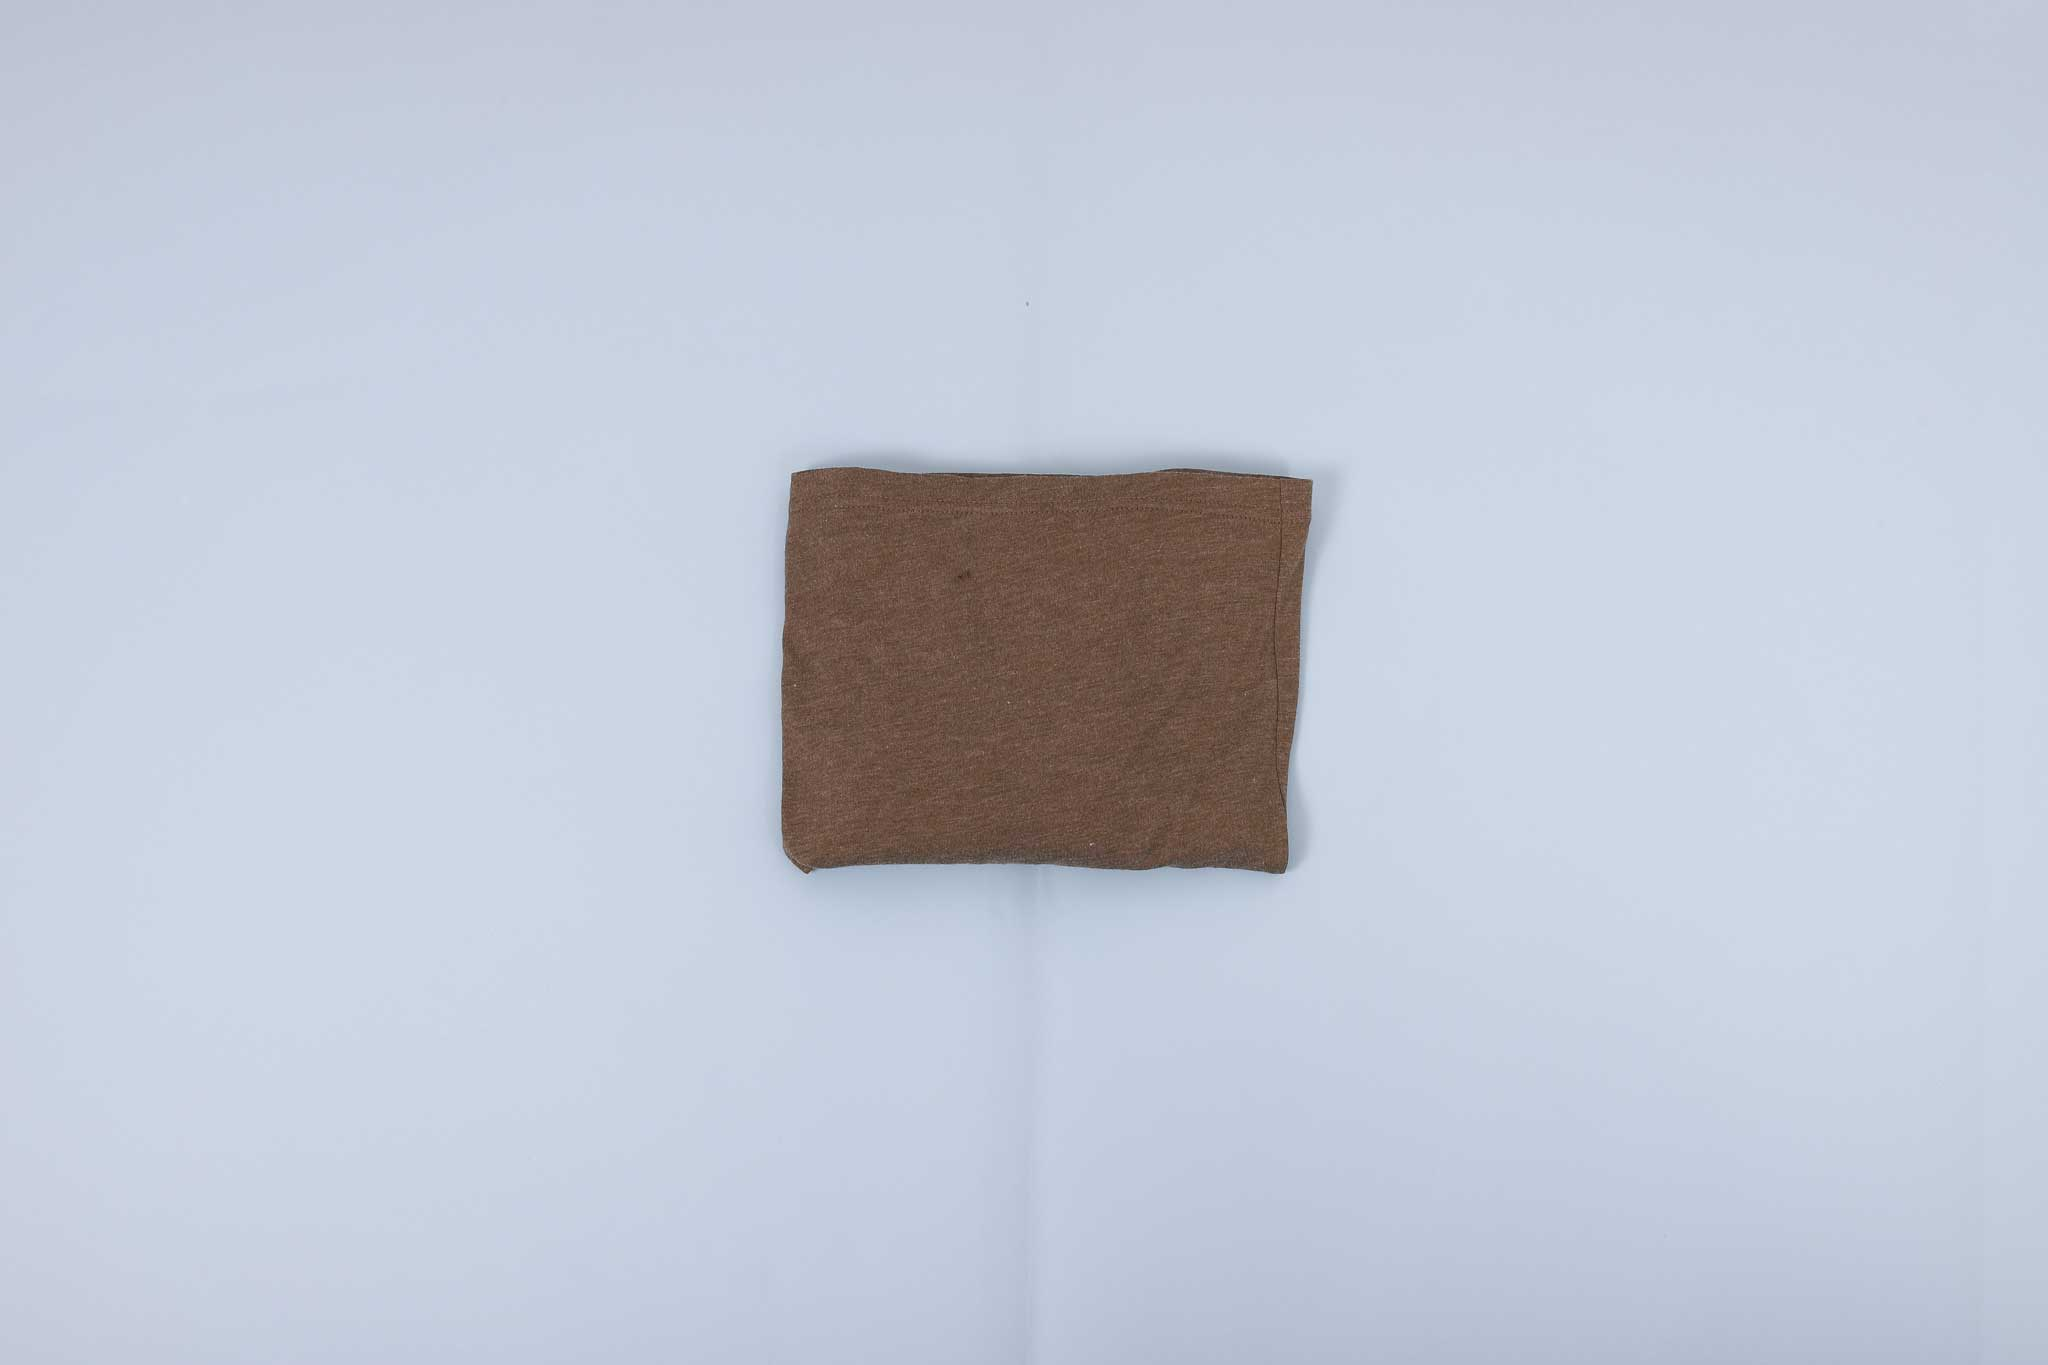 Olive long sleeve shirt folded into a rectangle on a light blue background